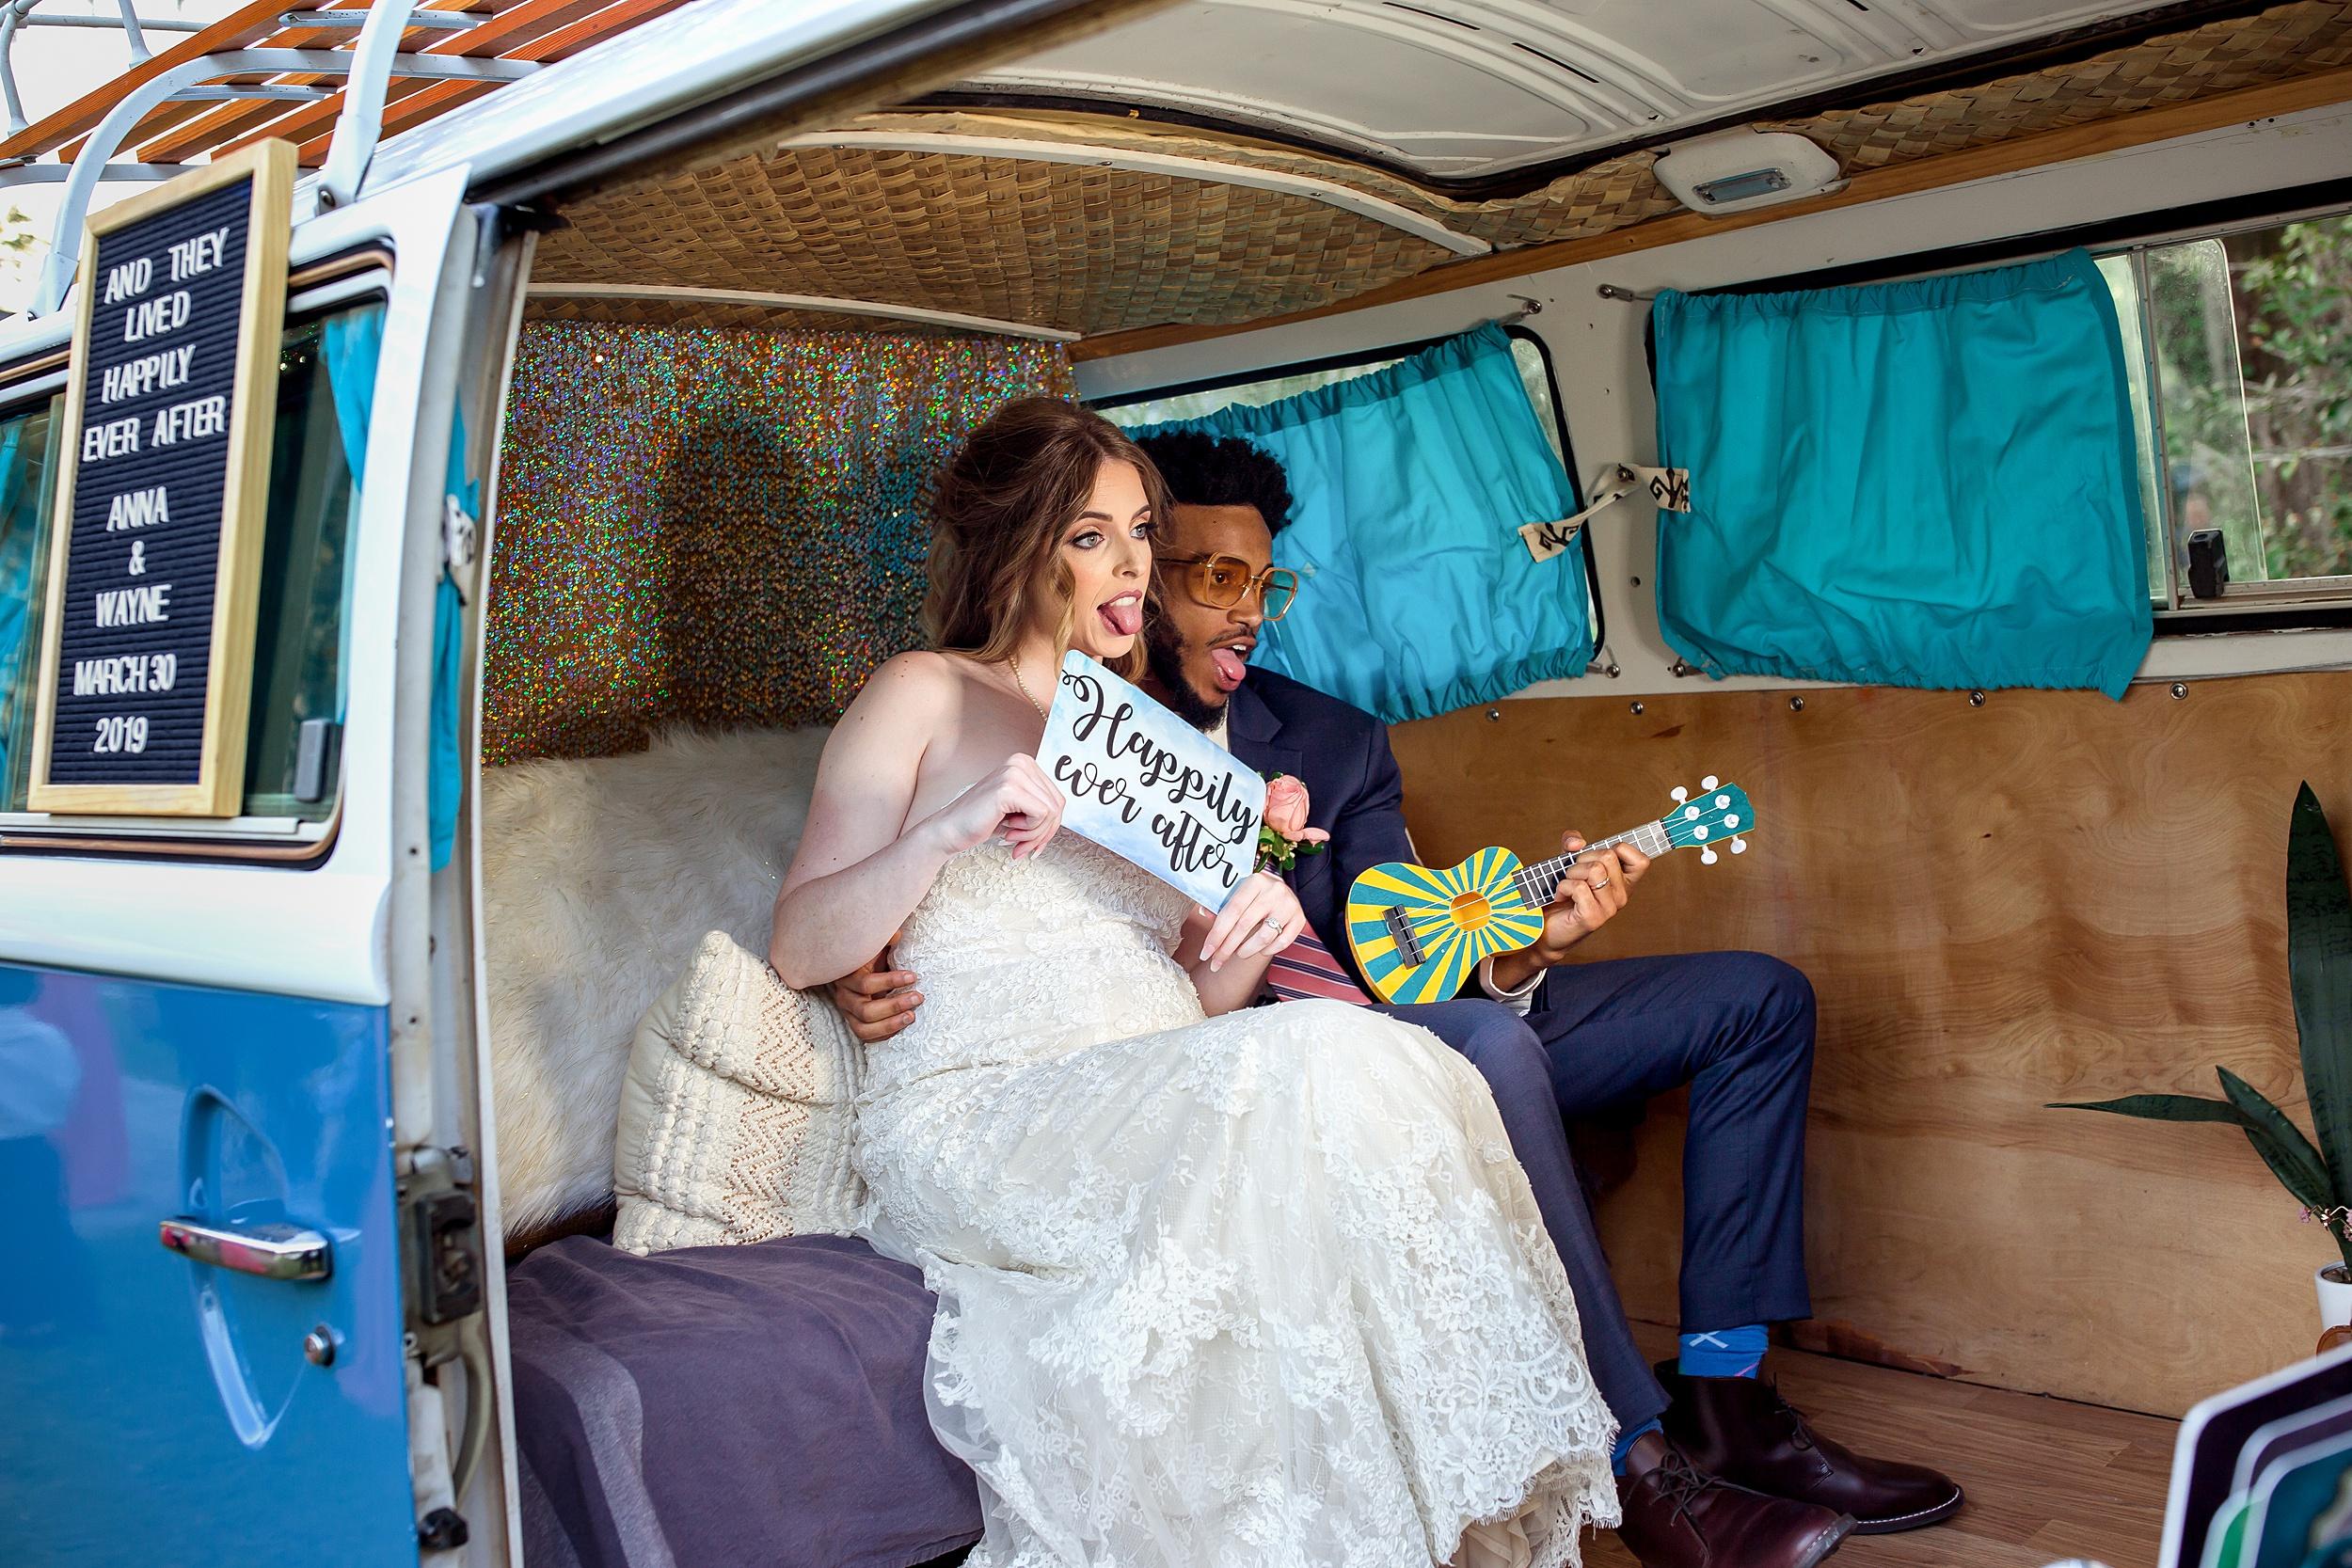 Gypsy_Belle_Photobooth_Tallahassee_Wedding.jpg